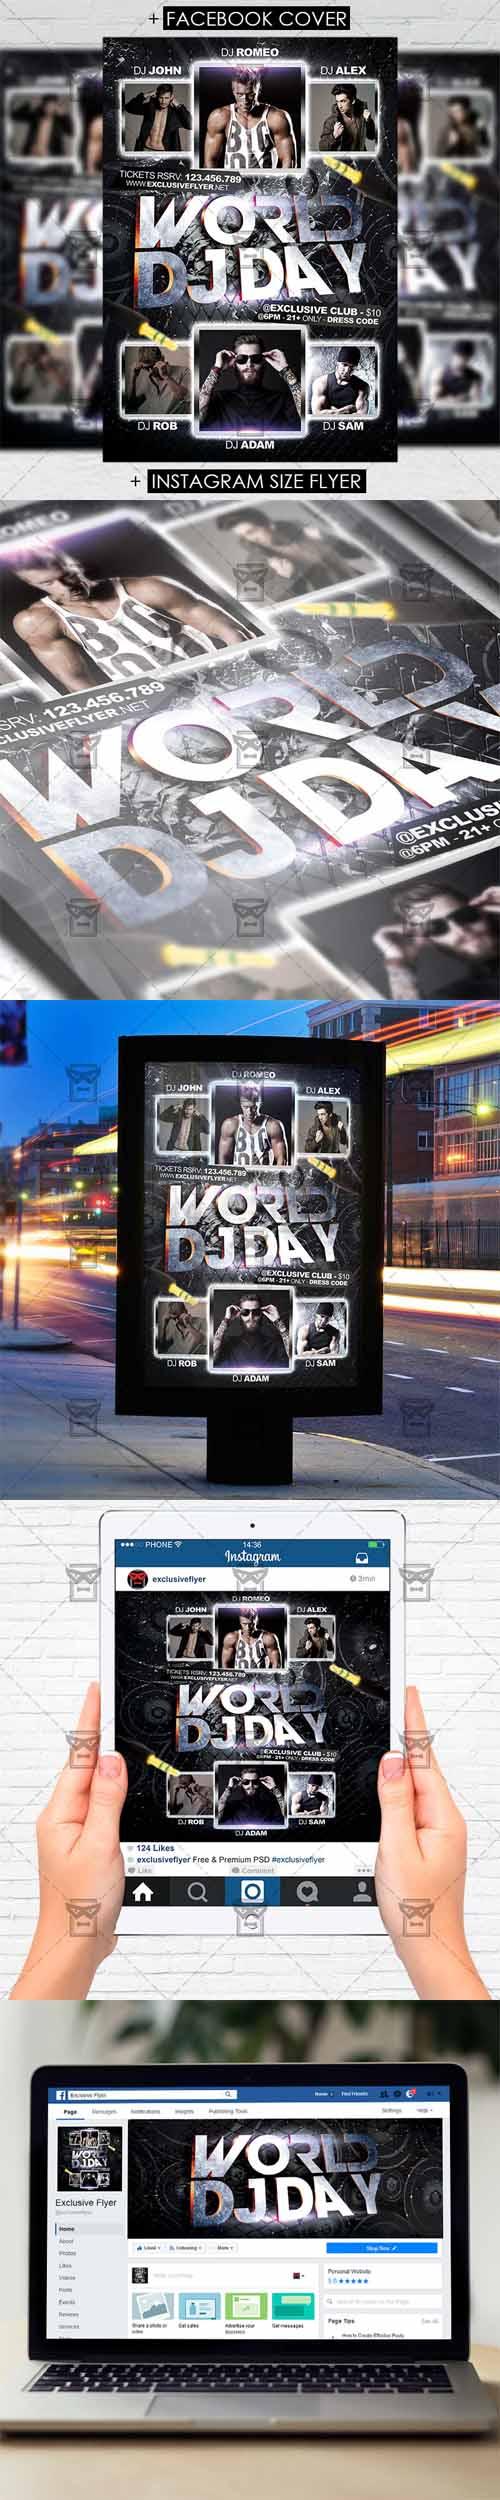 Flyer Template - World DJ Day